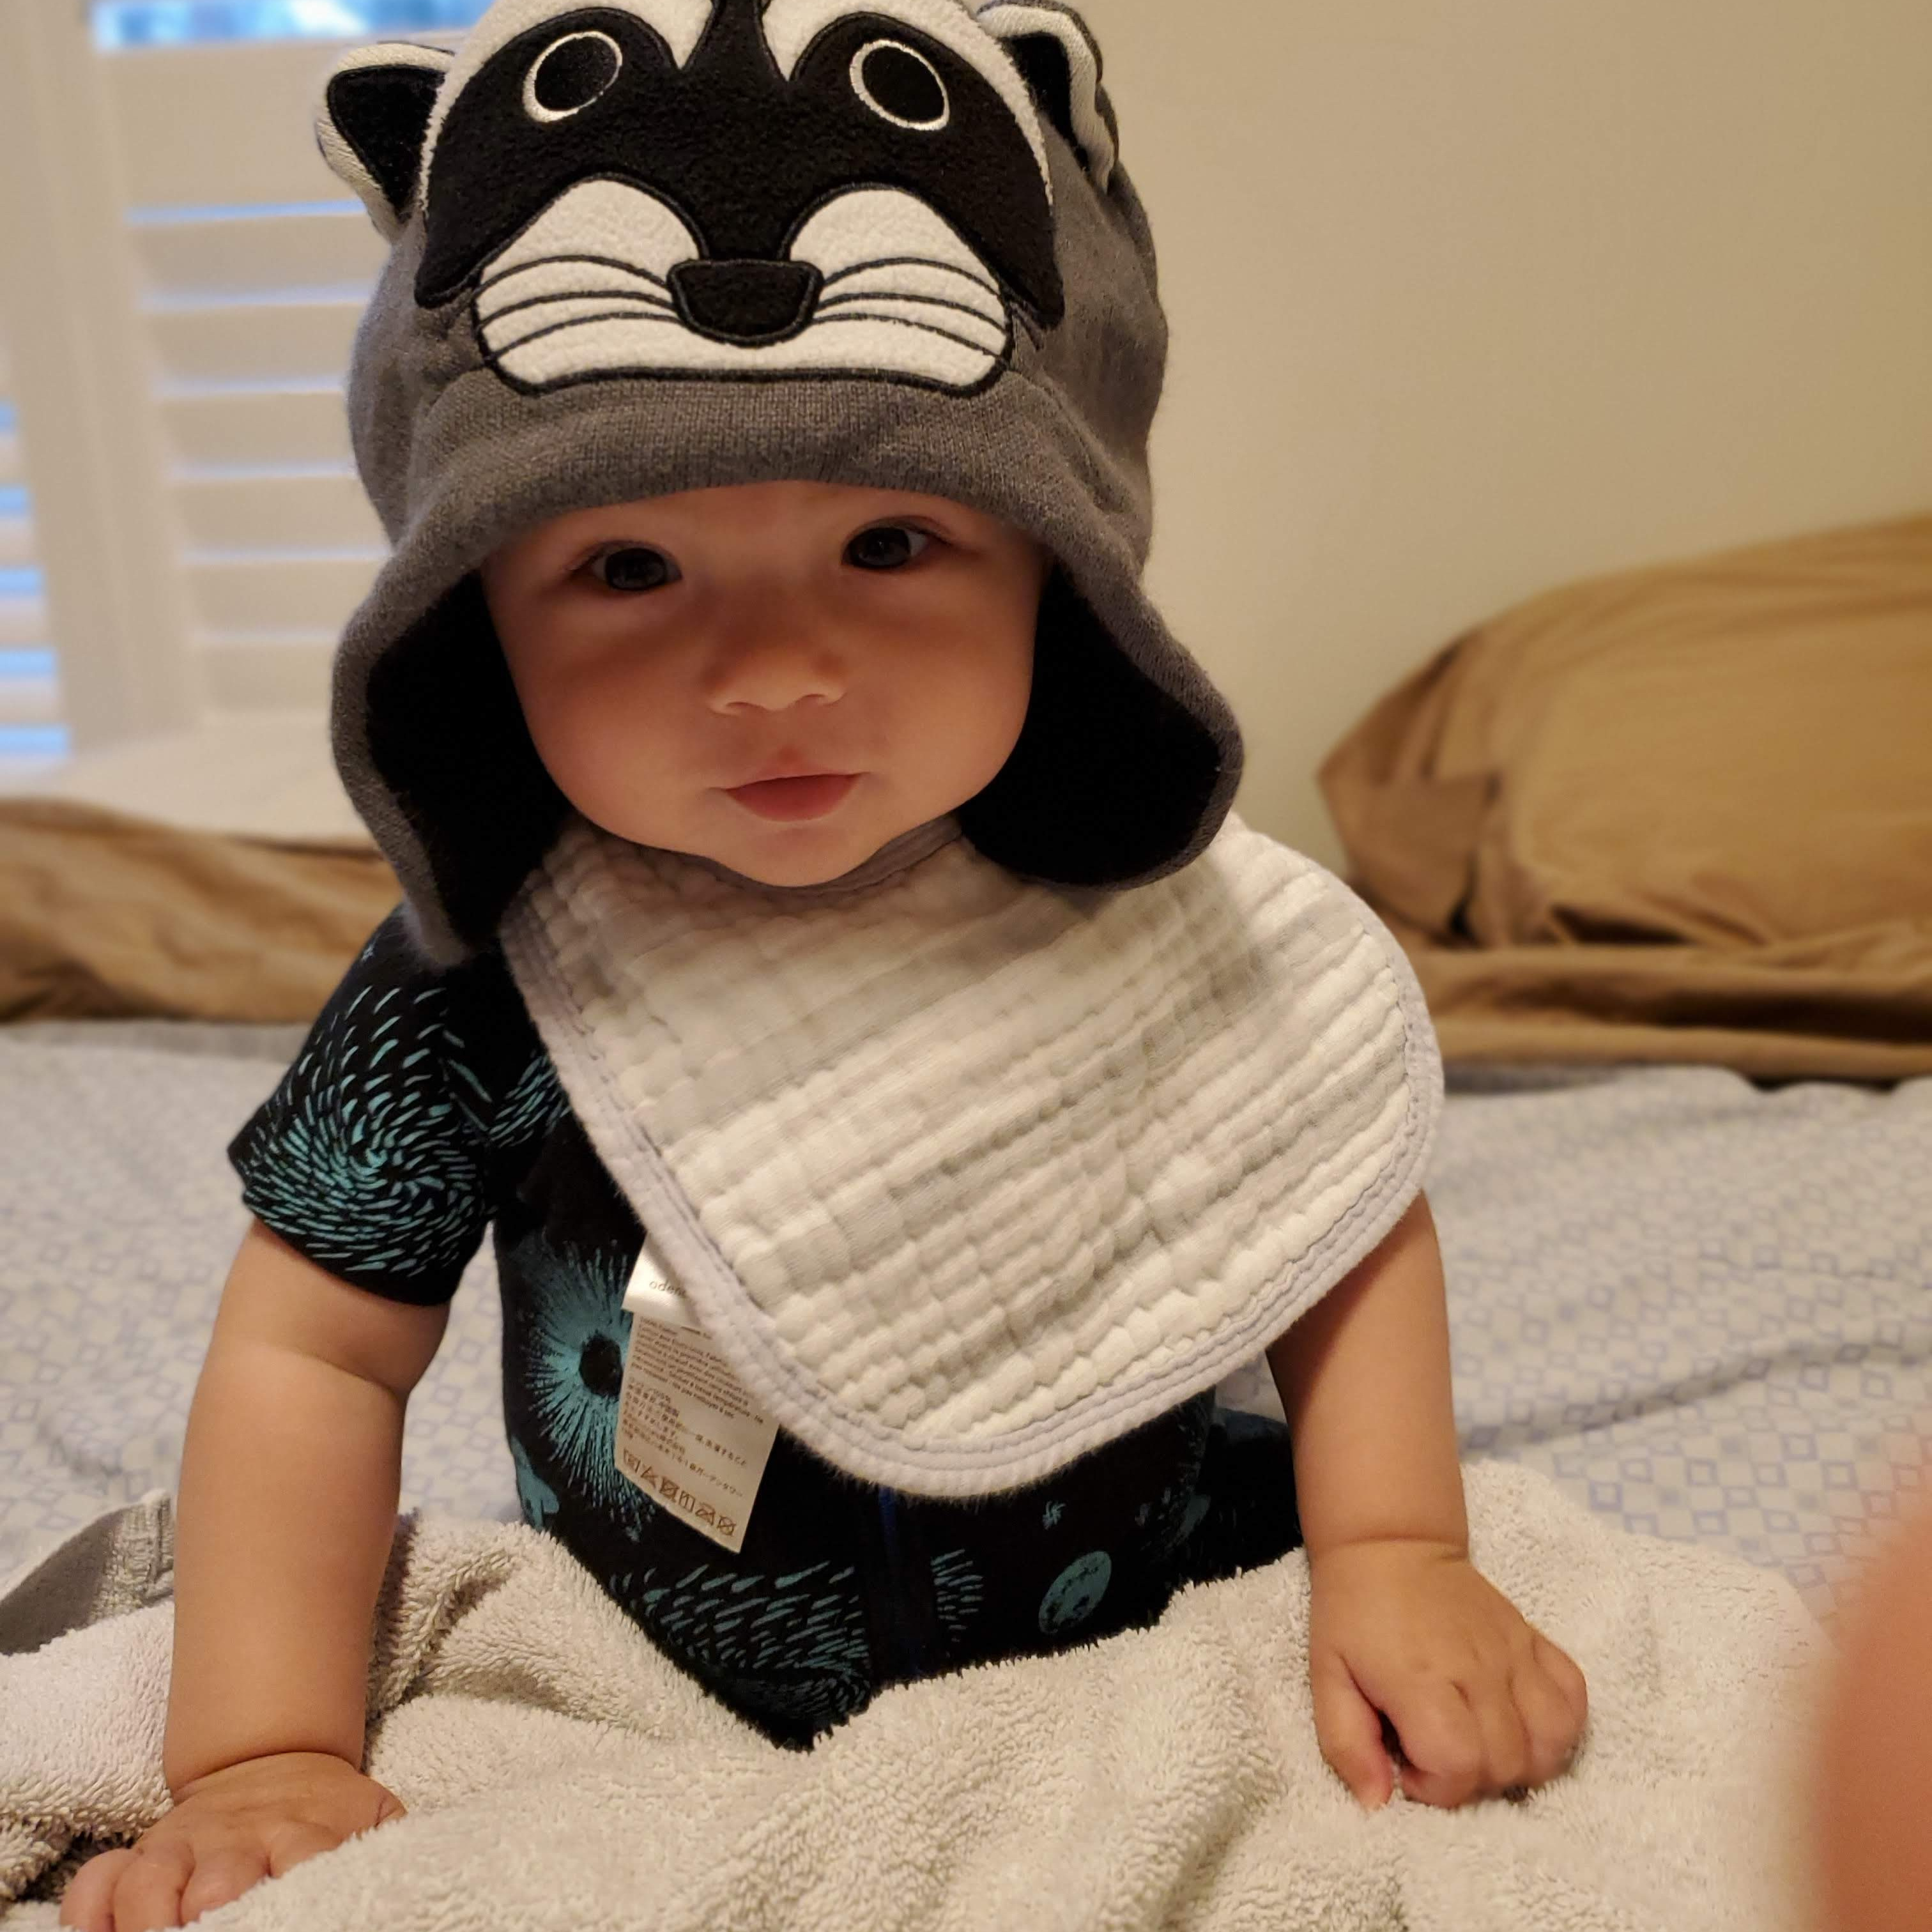 Baby Nico